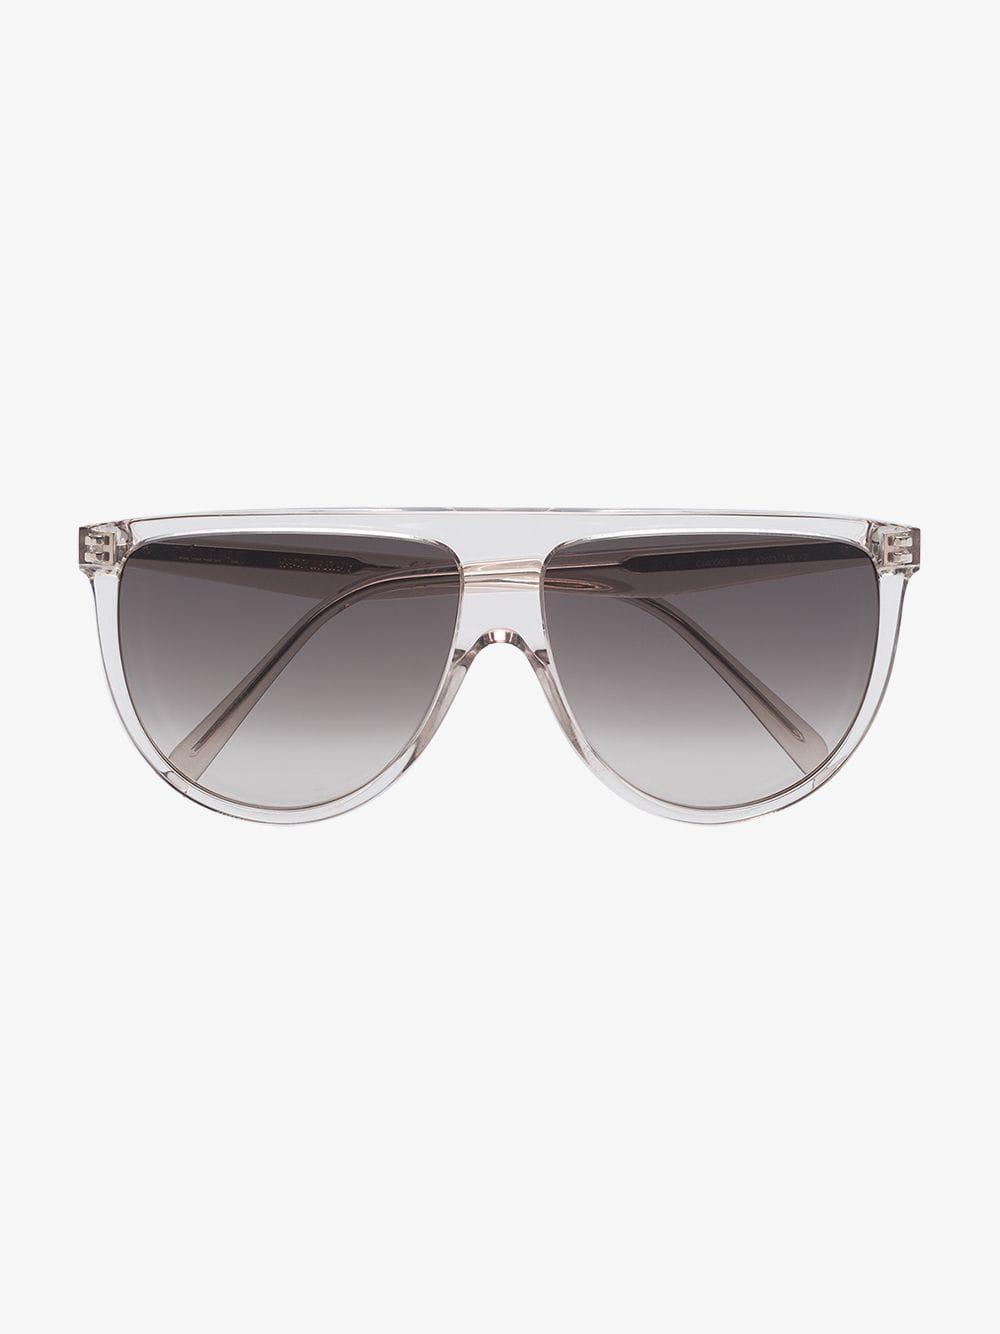 56af9e16086 Céline Celine Eyewear Aviator Sunglasses in Gray - Lyst